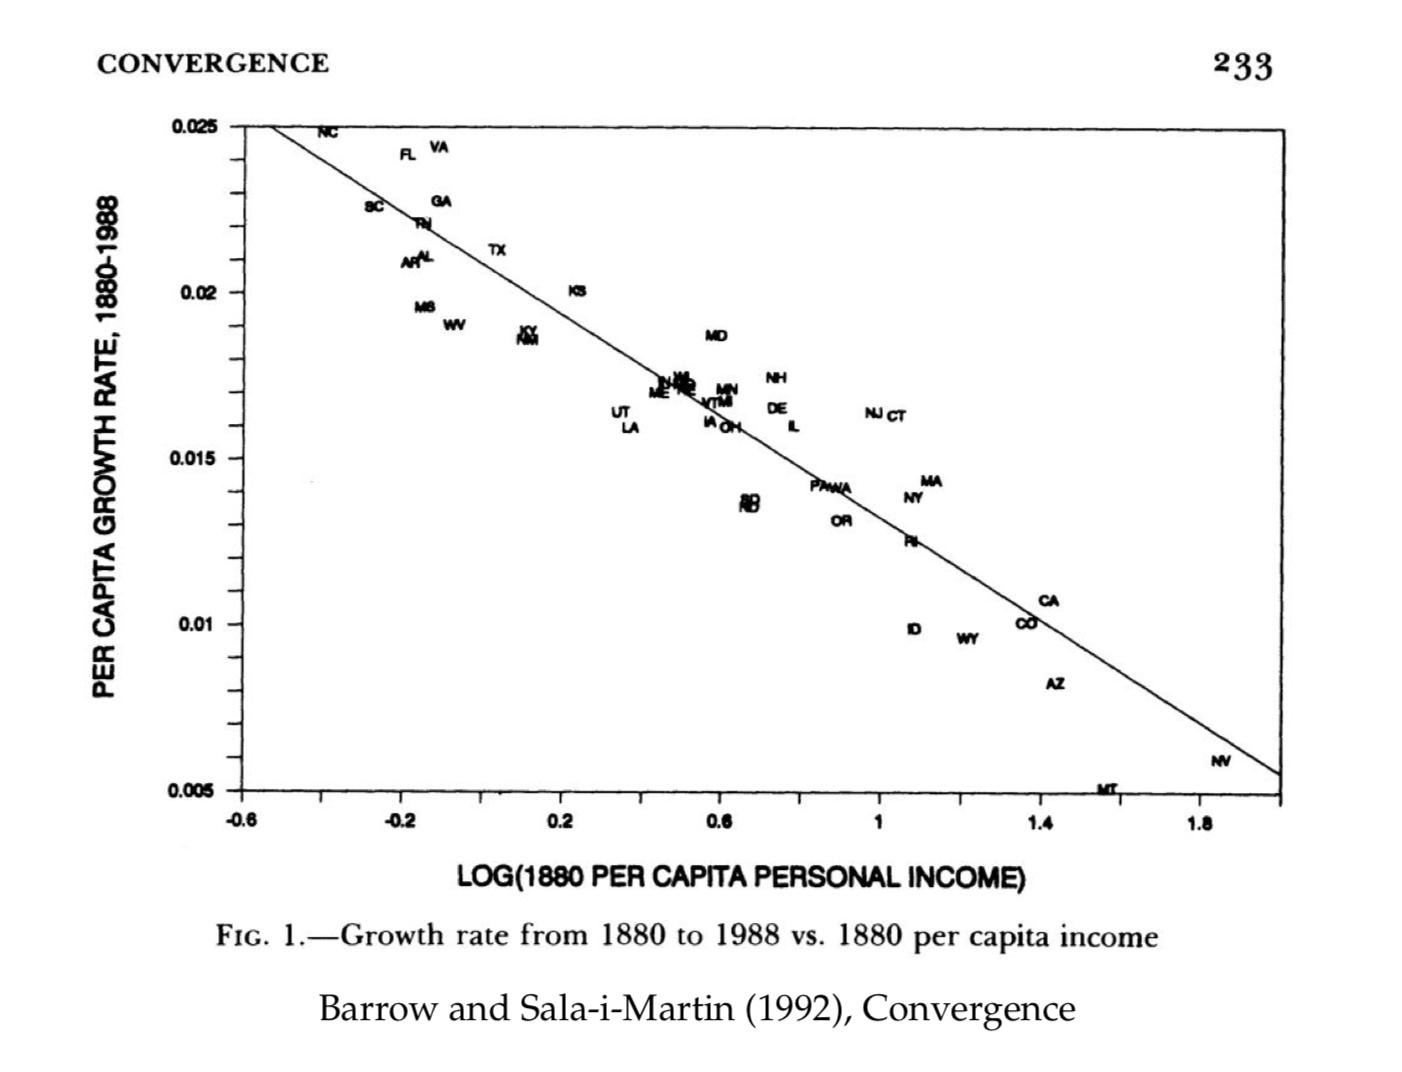 233 CONVERGENCE 0.025 GA TX ARL 0.02 MD DE L UT LA NJ CT 0.015 MA NY PAWA AB CA 0.01 WY AZ 0.005 -0.6 -0.2 0.2 O.6 1 1.4 1.8 LOG(1880 PER CAPITA PERSONAL INCOME) FIG. 1-Growth rate from 1880 to 1988 vs. 1880 per capita income Barrow and Sala-i-Martin (1992), Convergence PER CAPITA GROWTH RATE, 1880-1988